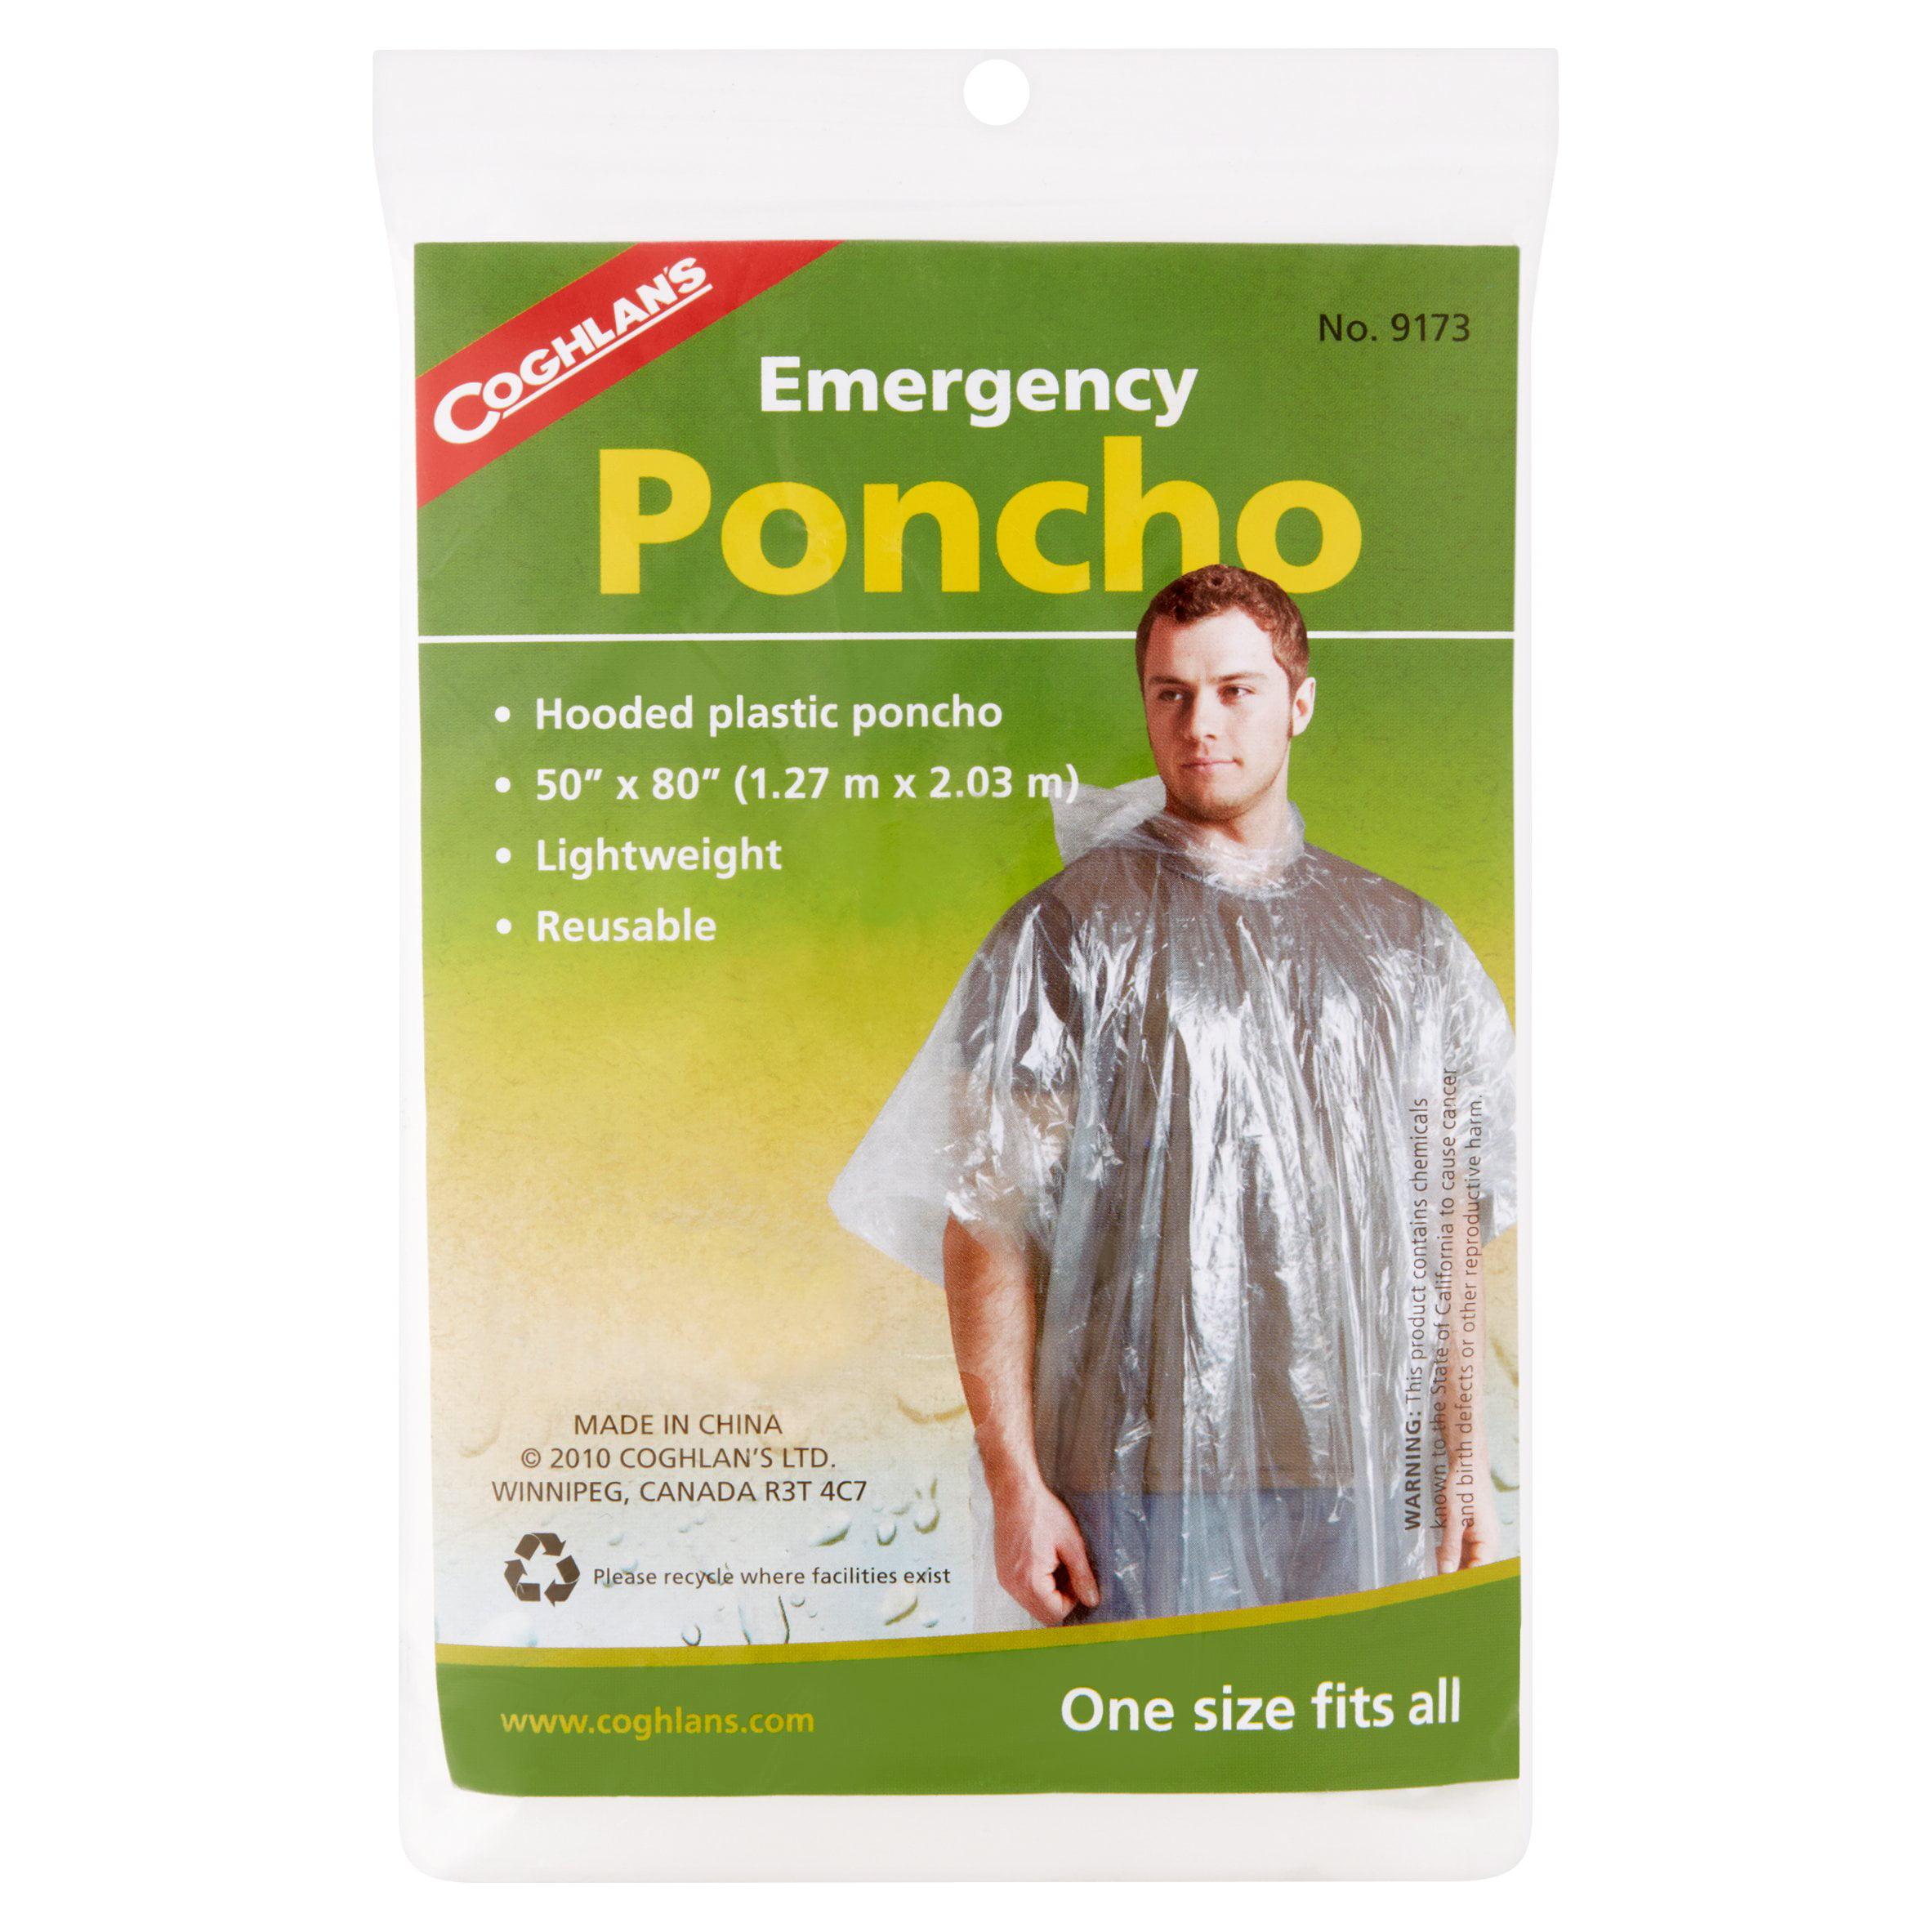 Coghlan's Emergency Poncho by Coghlan'S Ltd.